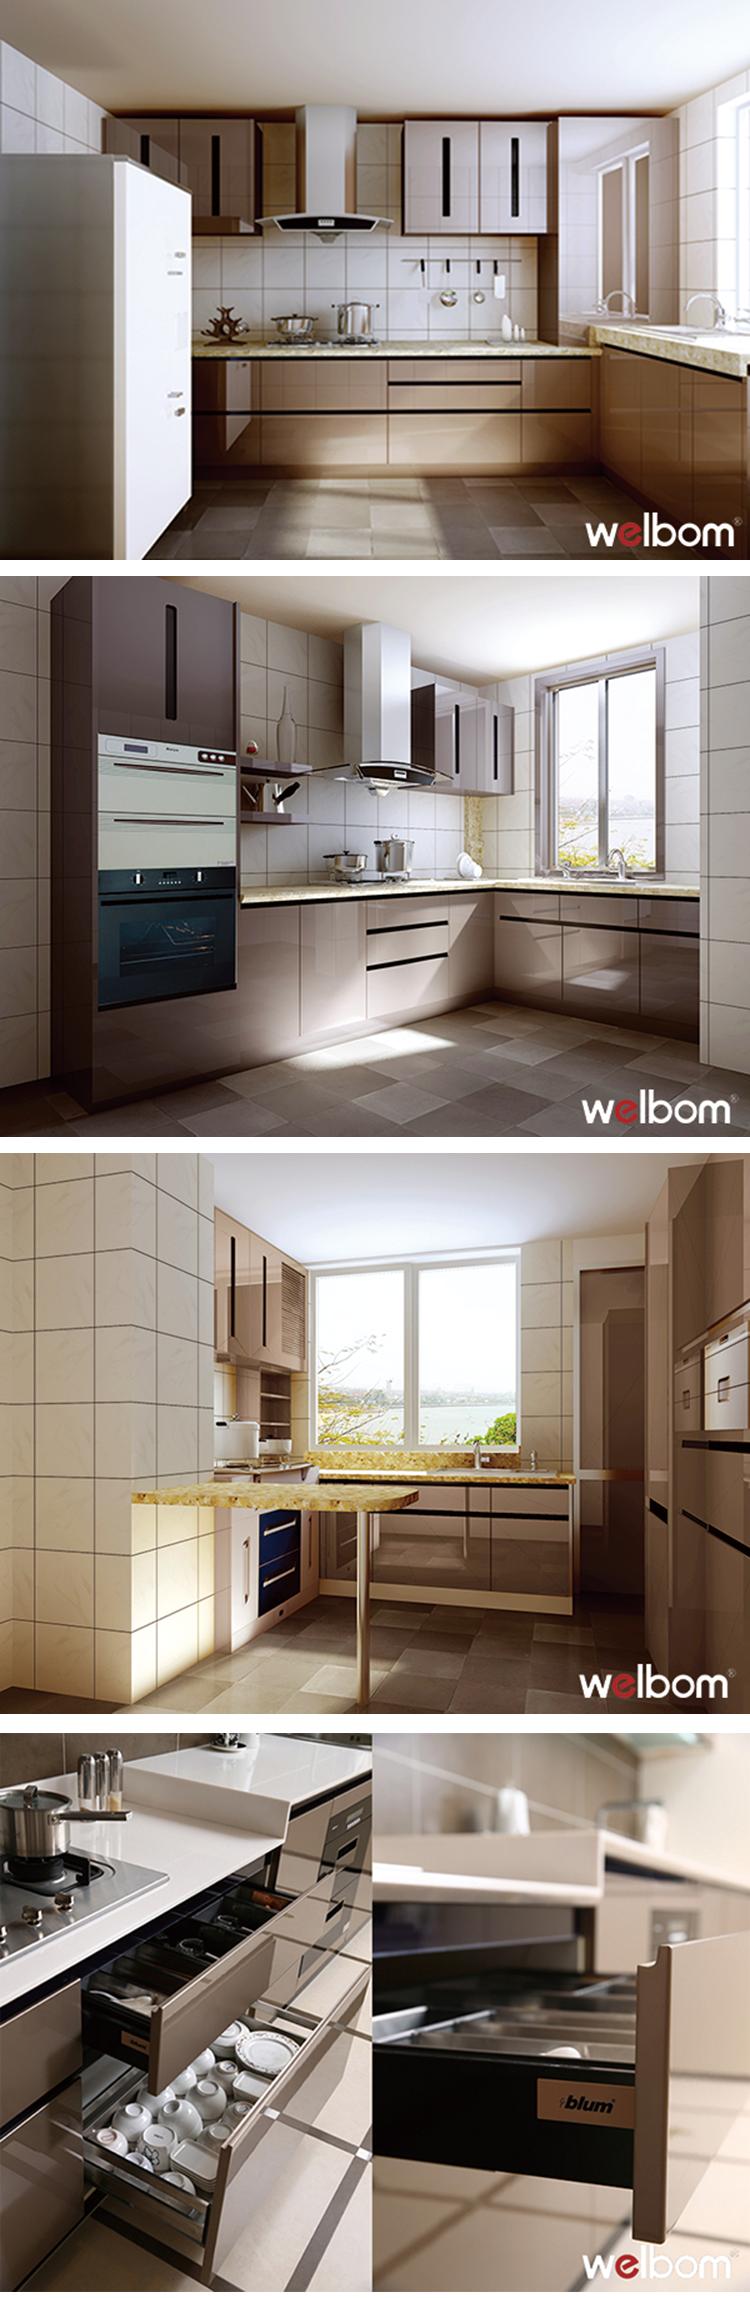 Welbom High Gloss Kitchen Cabinets Finish Reviews Buy Kitchen